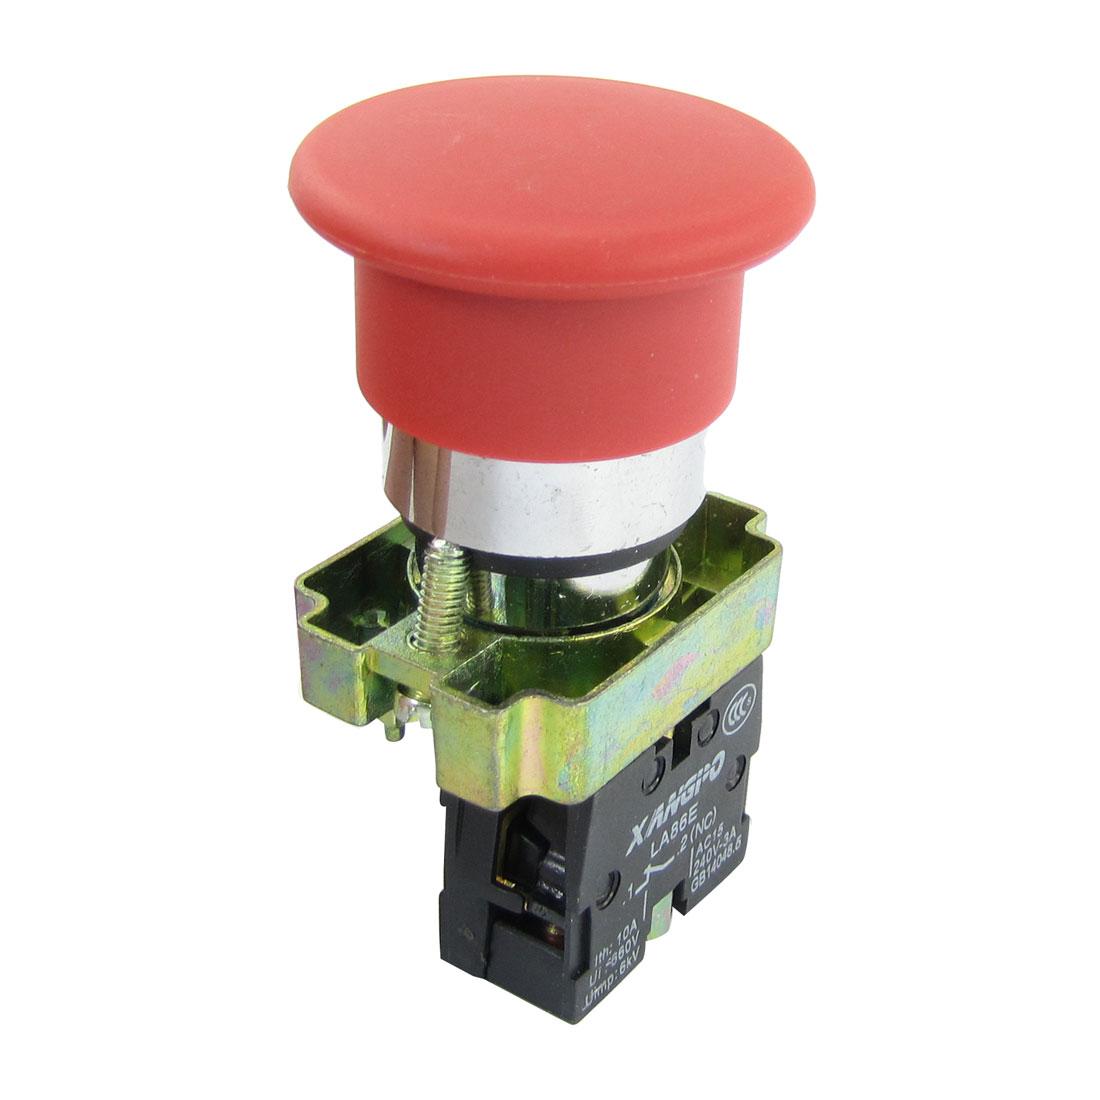 AC 240V 3A SPST Panel Mounting Self Lock Red Mushroom Head Push Botton Switch